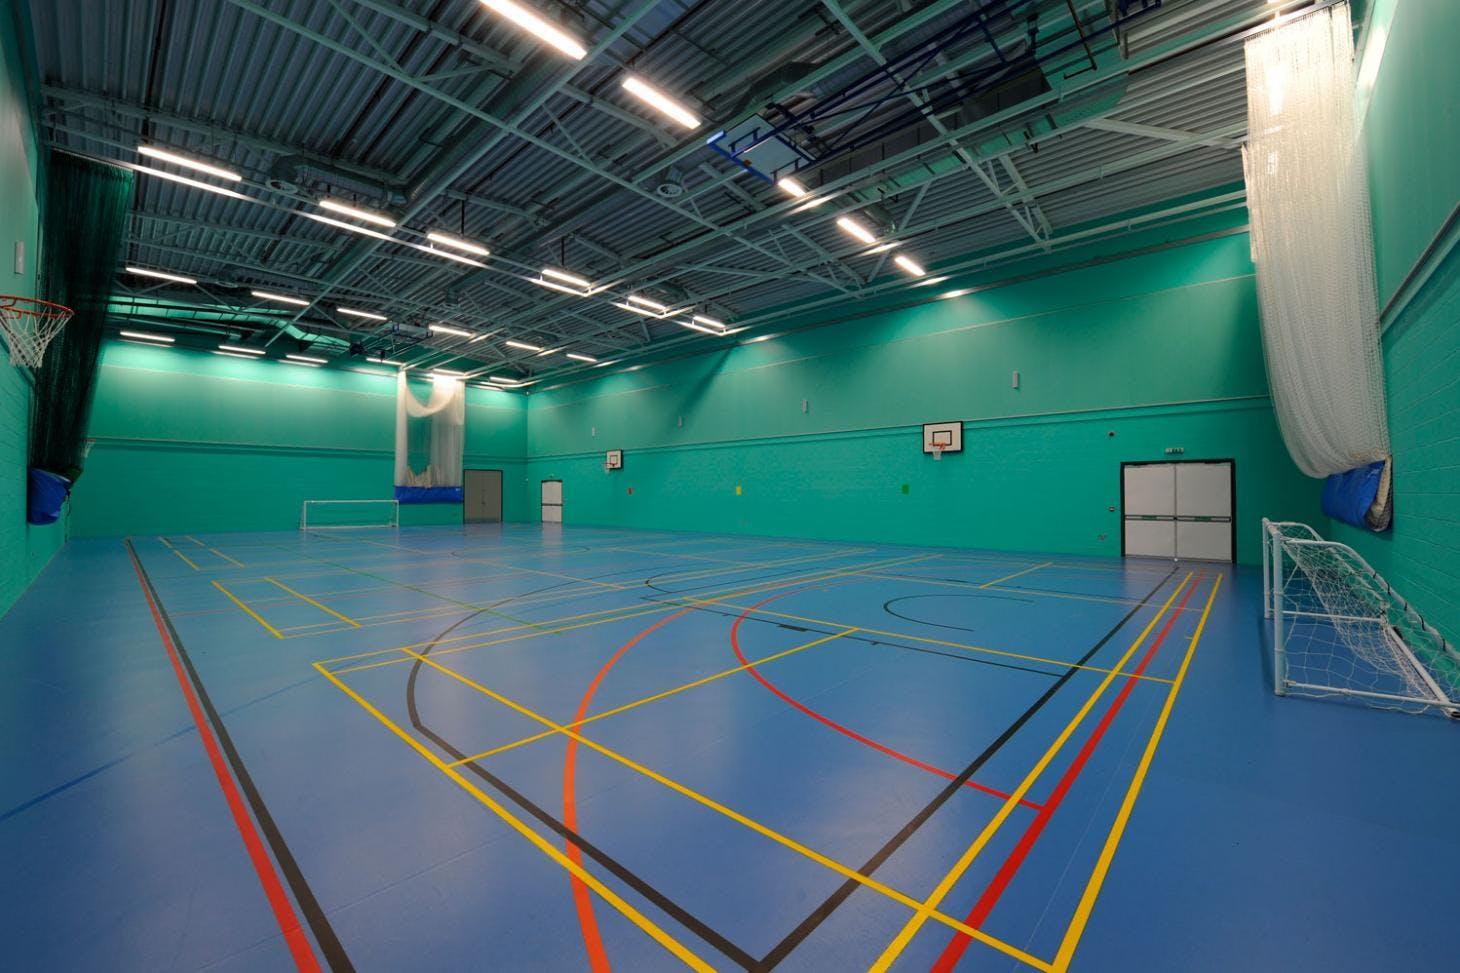 Challney High School for Girls Indoor basketball court